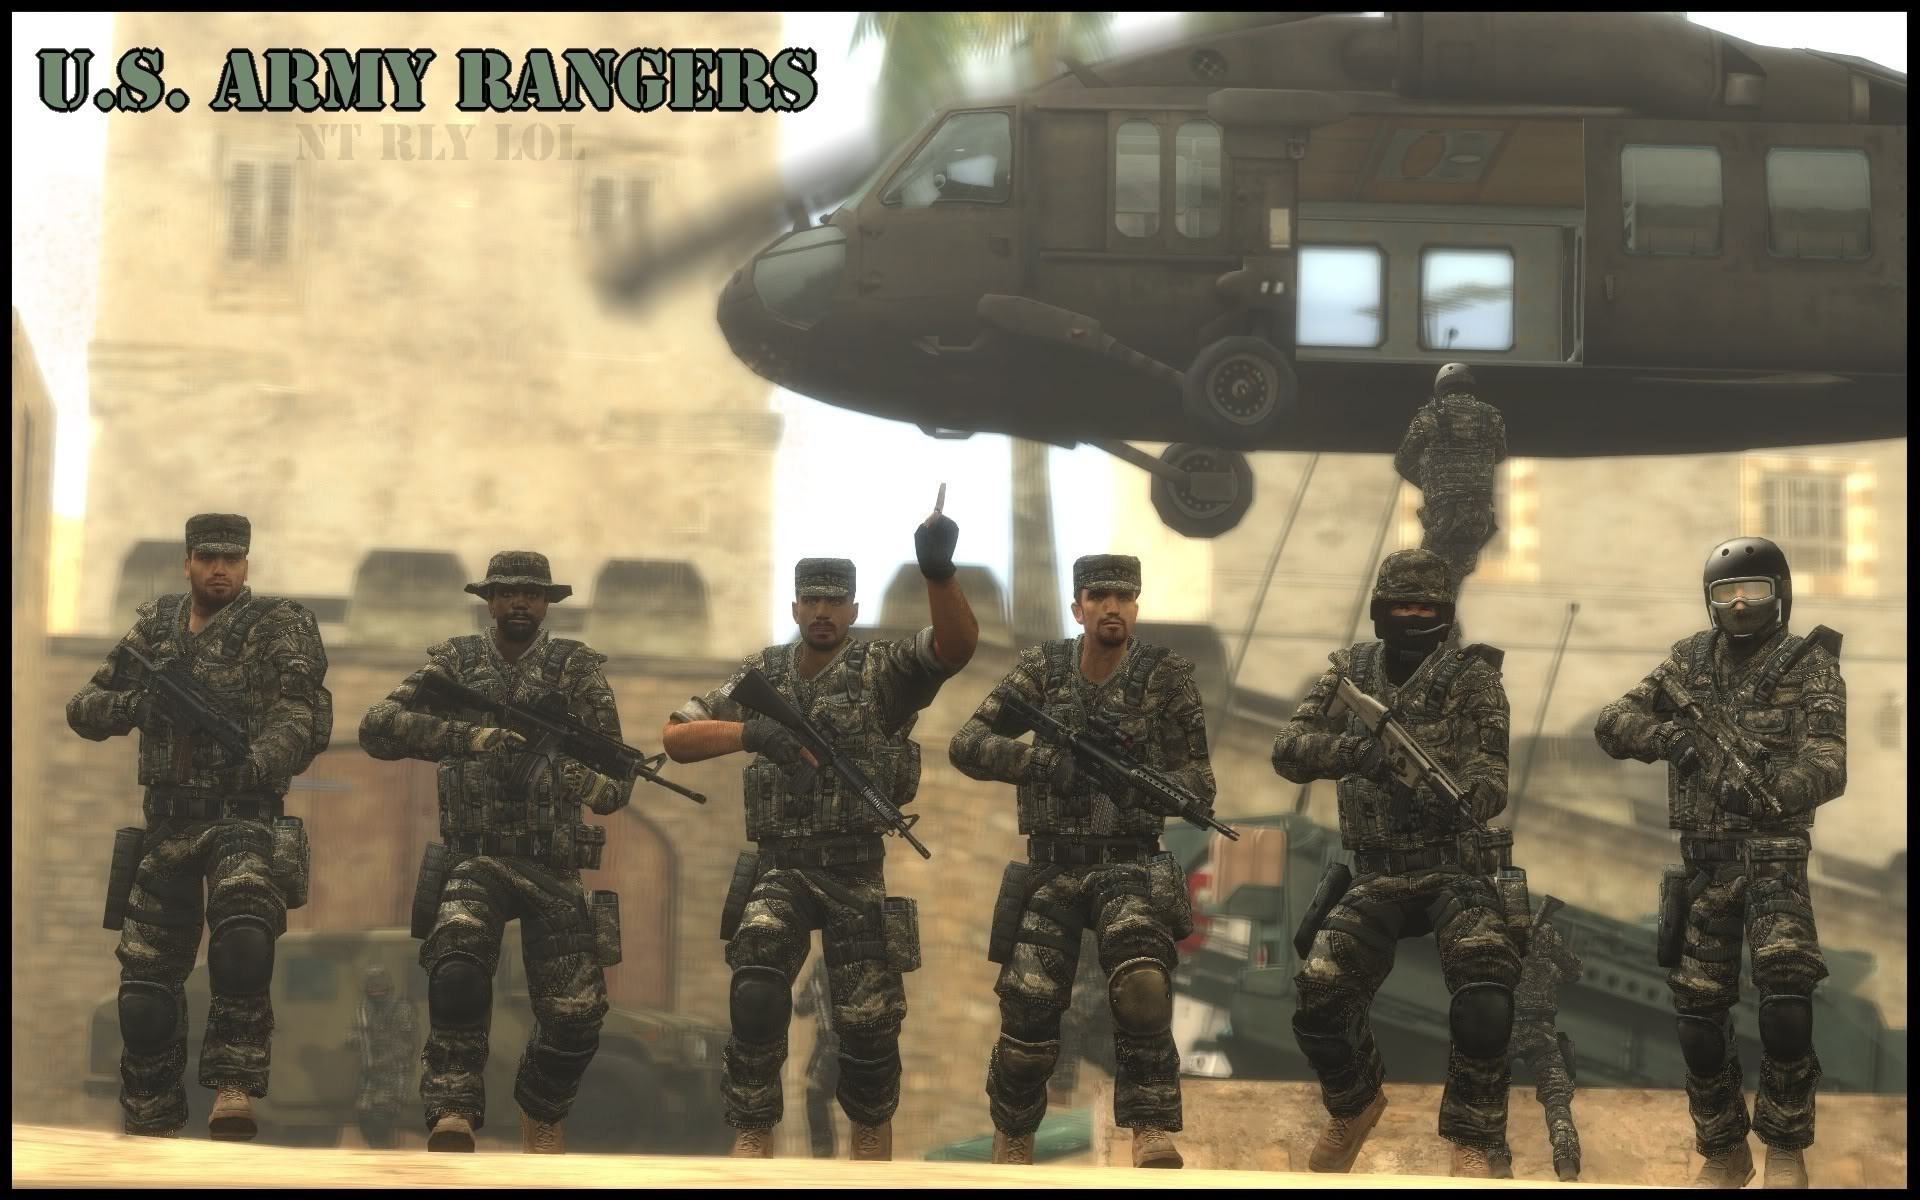 U.S. Army Rangers …